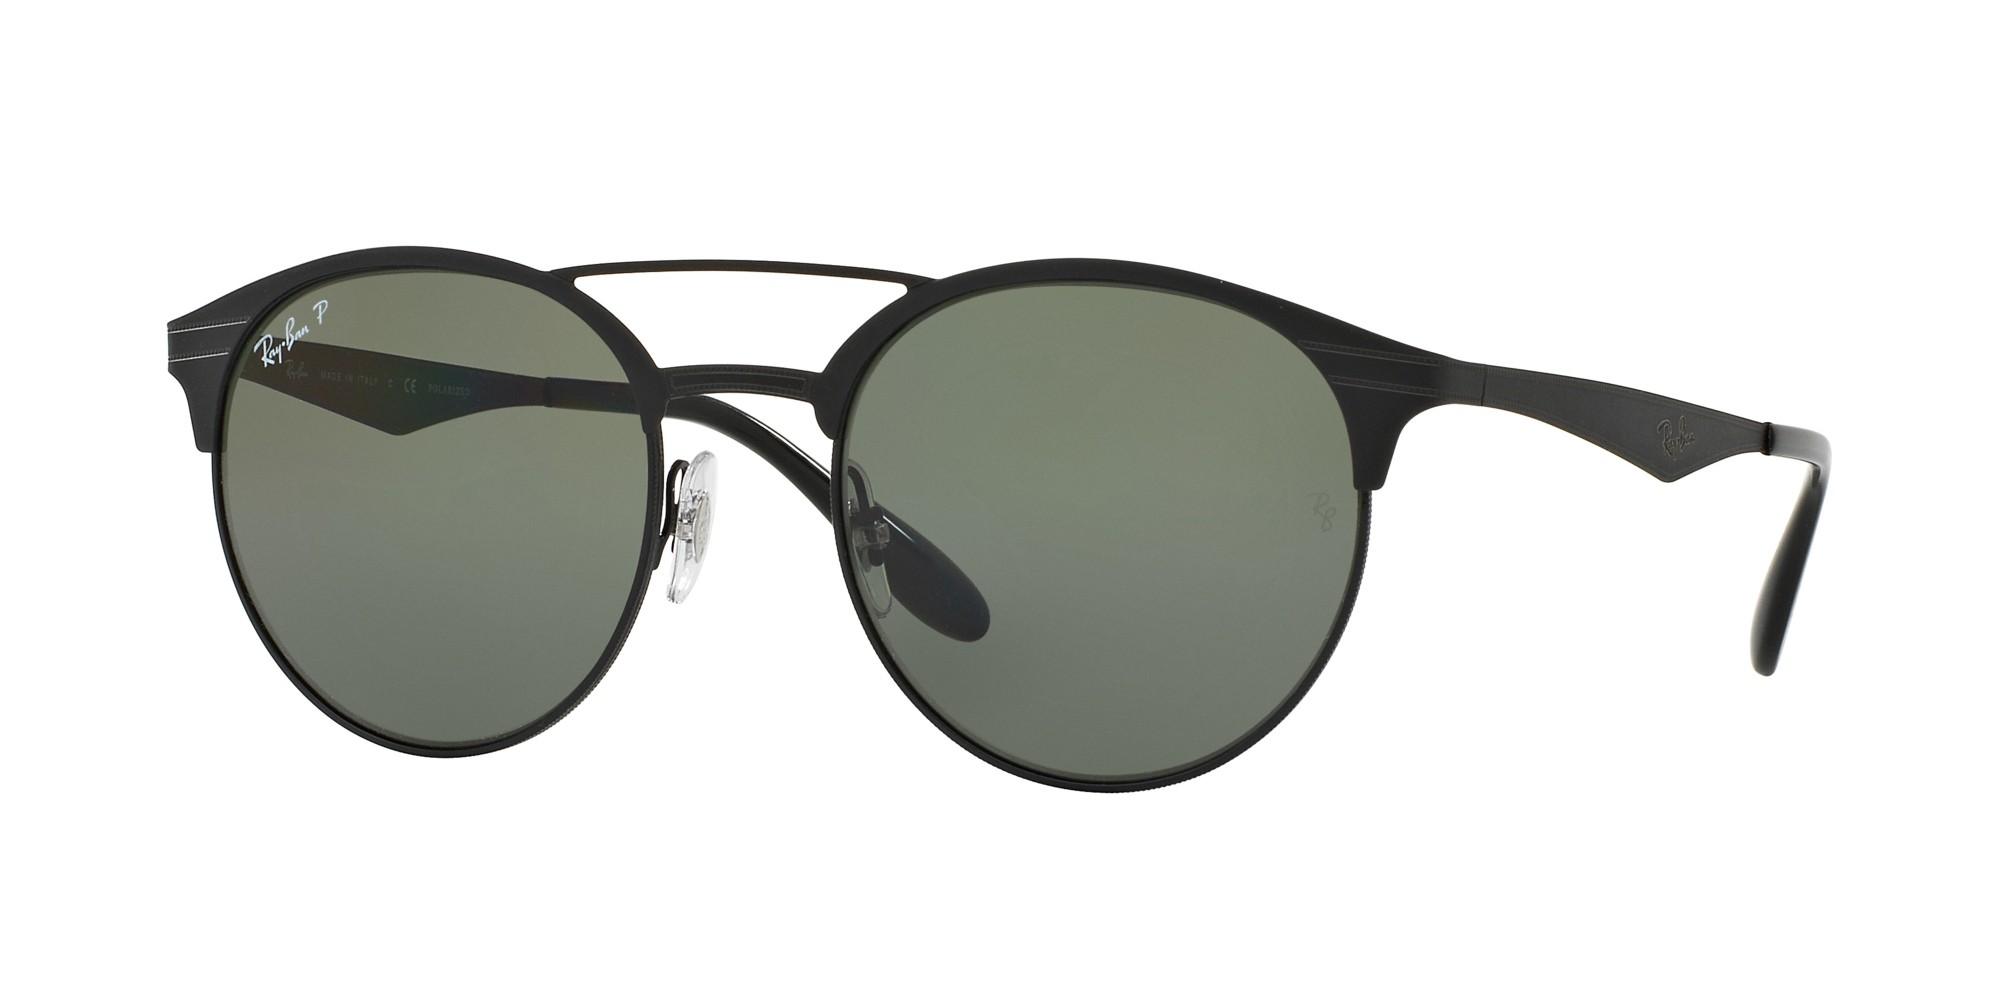 1d91f3bd25 Ray-Ban RB3545 Phantos Sunglasses - Sunglasses